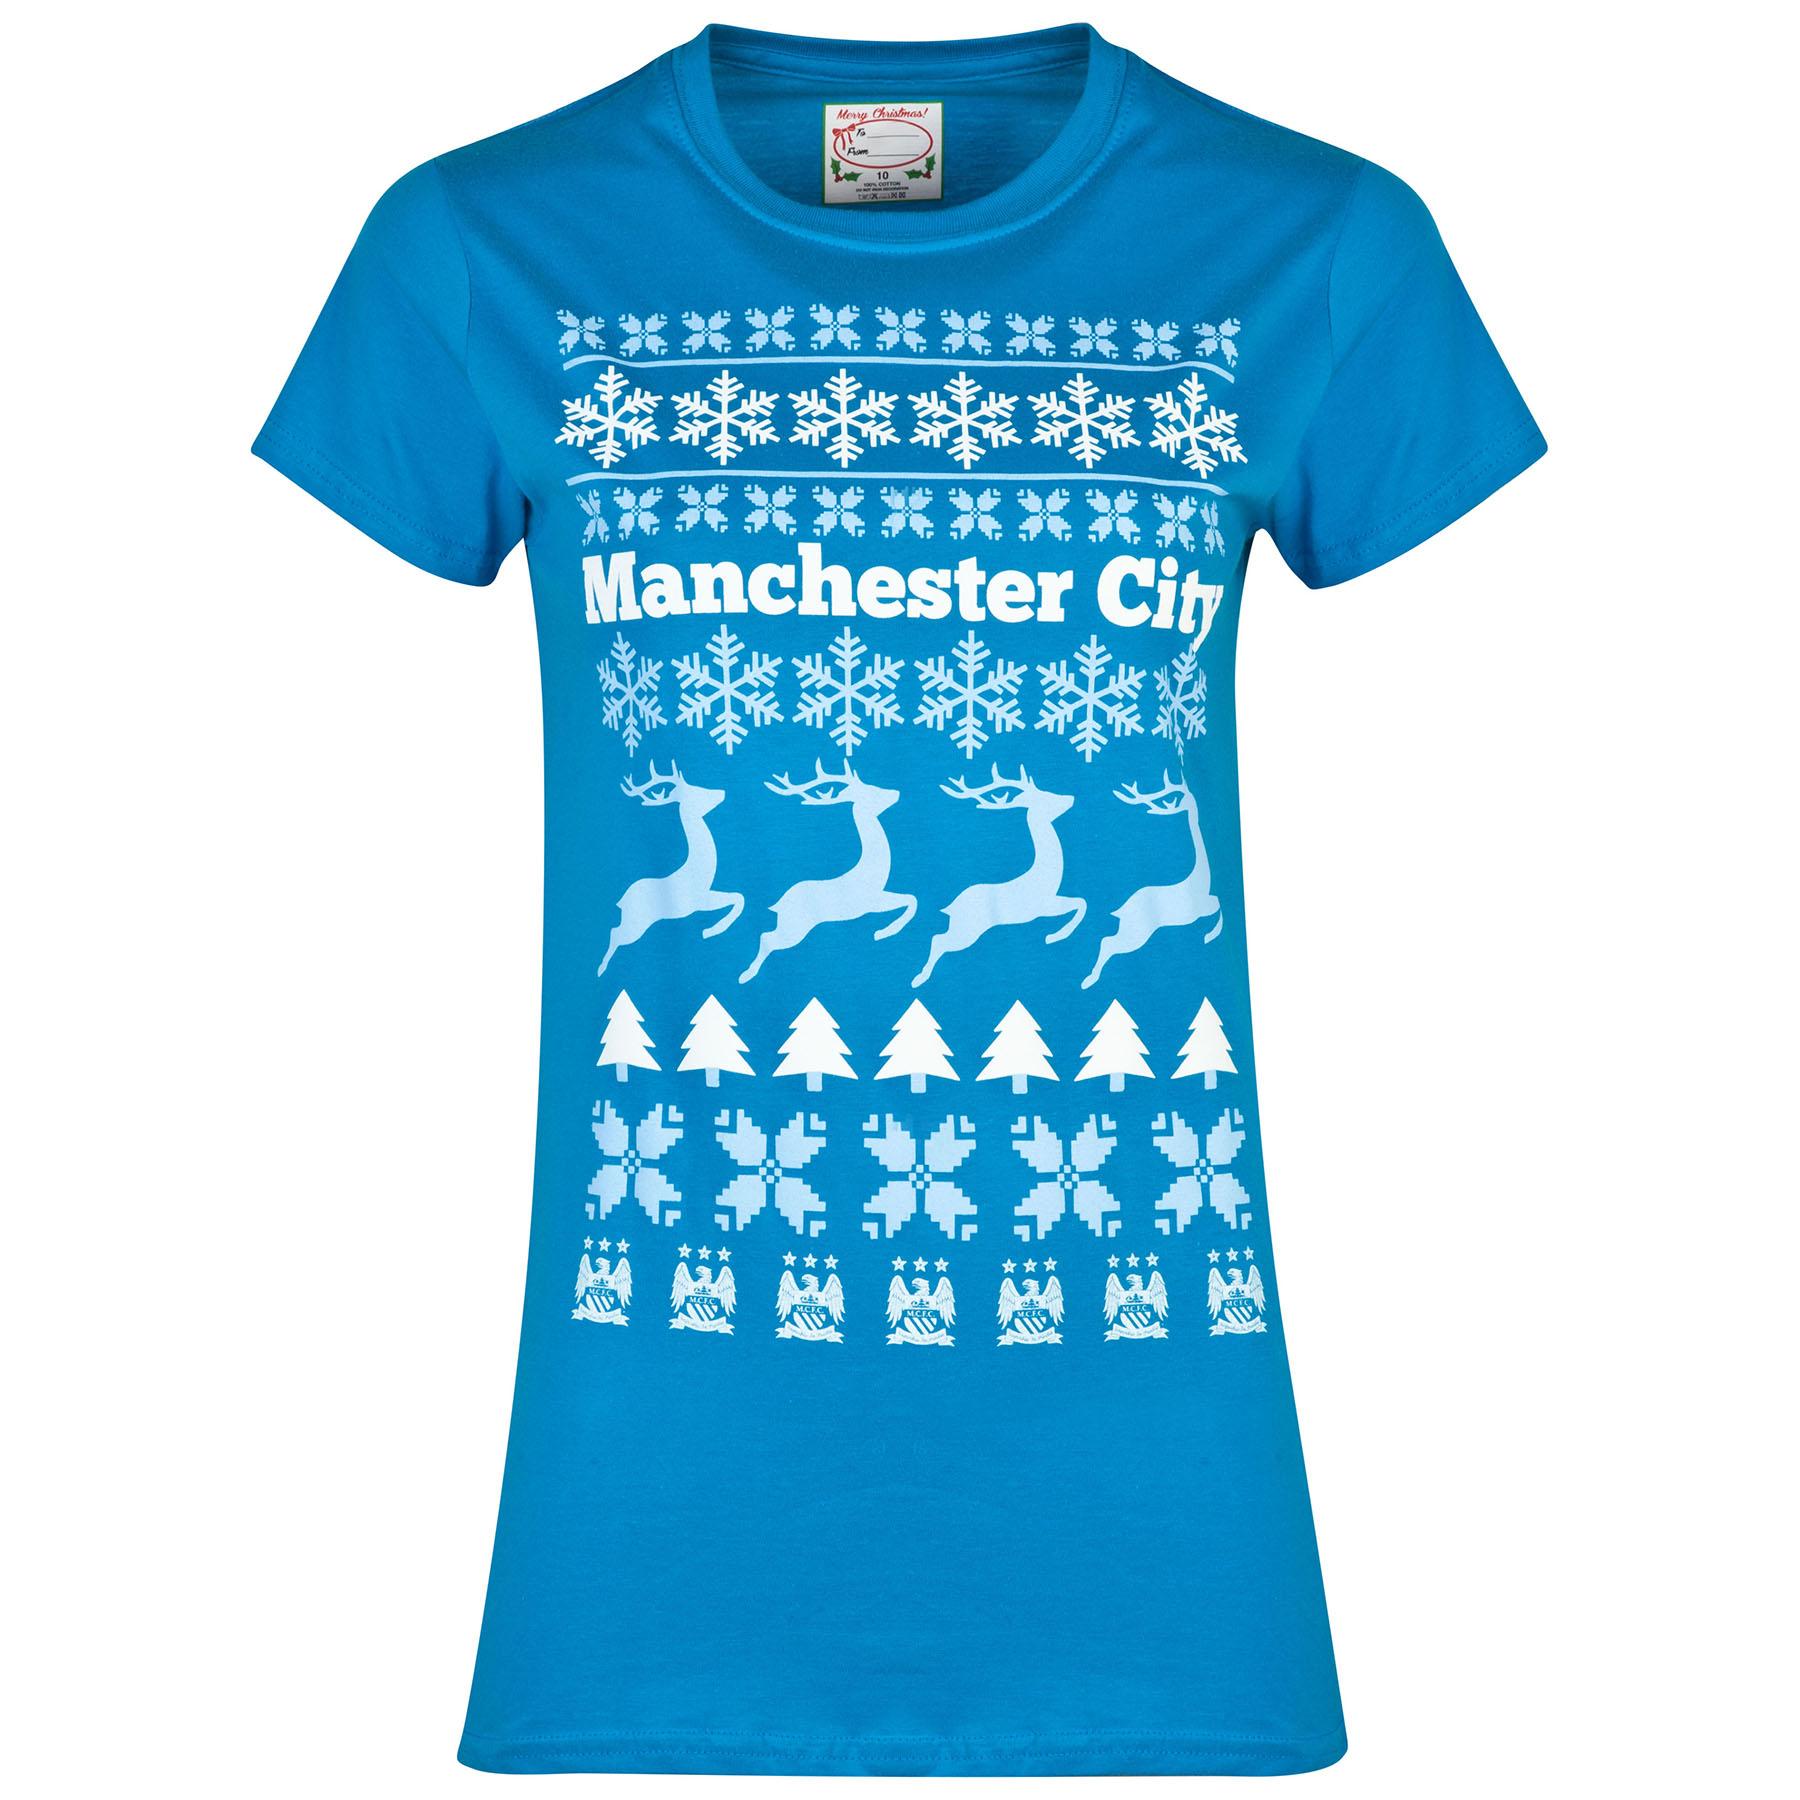 Manchester City 2for 20 Festive T-Shirt -Sapphire Blue - Womens